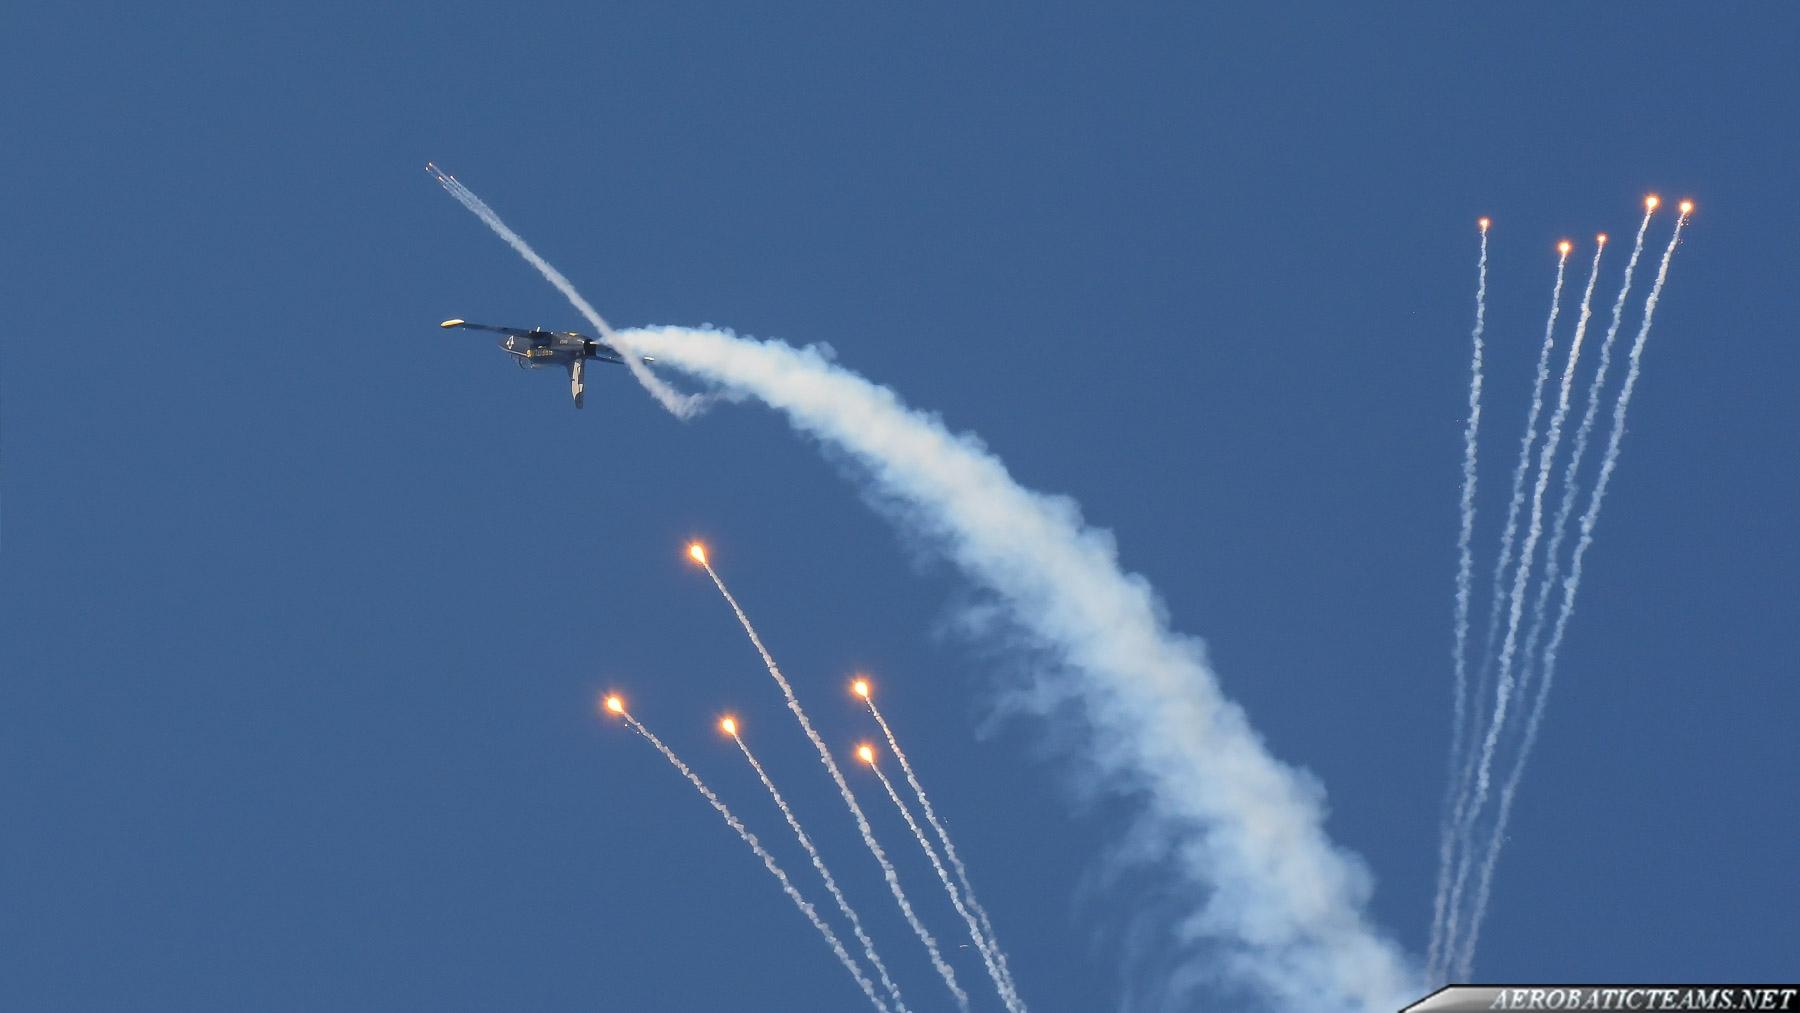 Breitling Jet Team L-39C